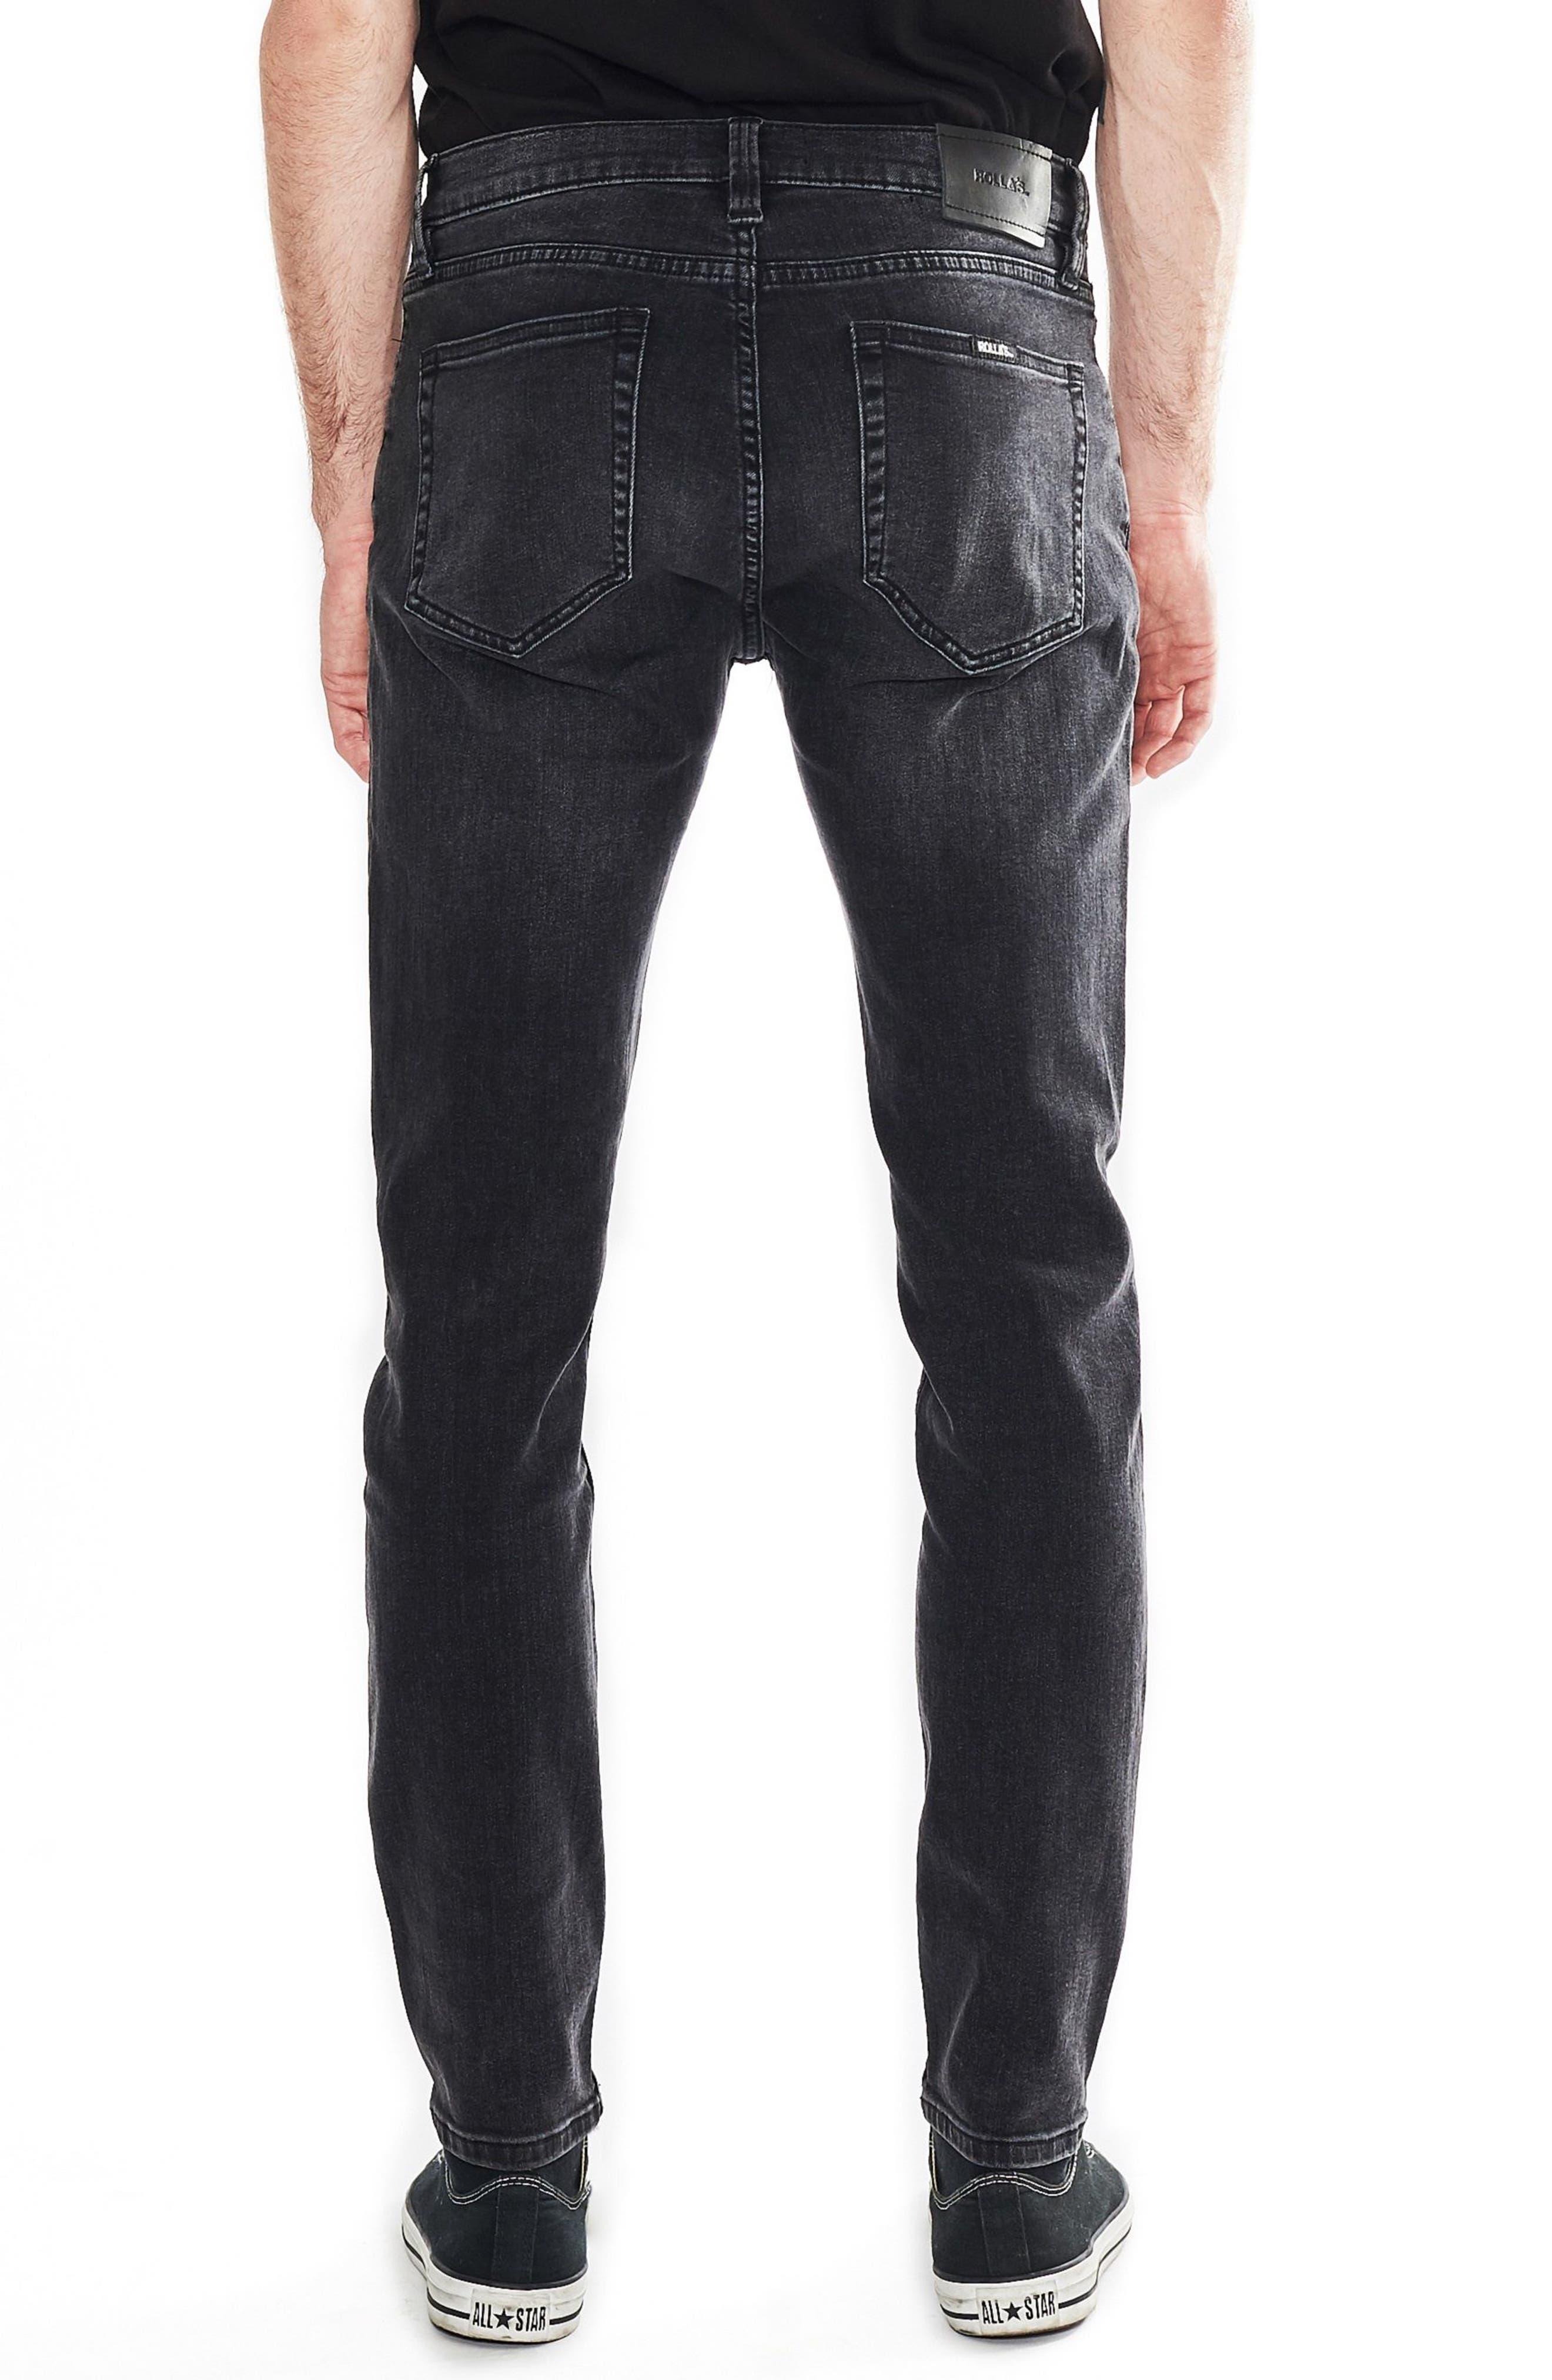 Stinger Skinny Fit Jeans,                             Alternate thumbnail 2, color,                             OLD GOLD